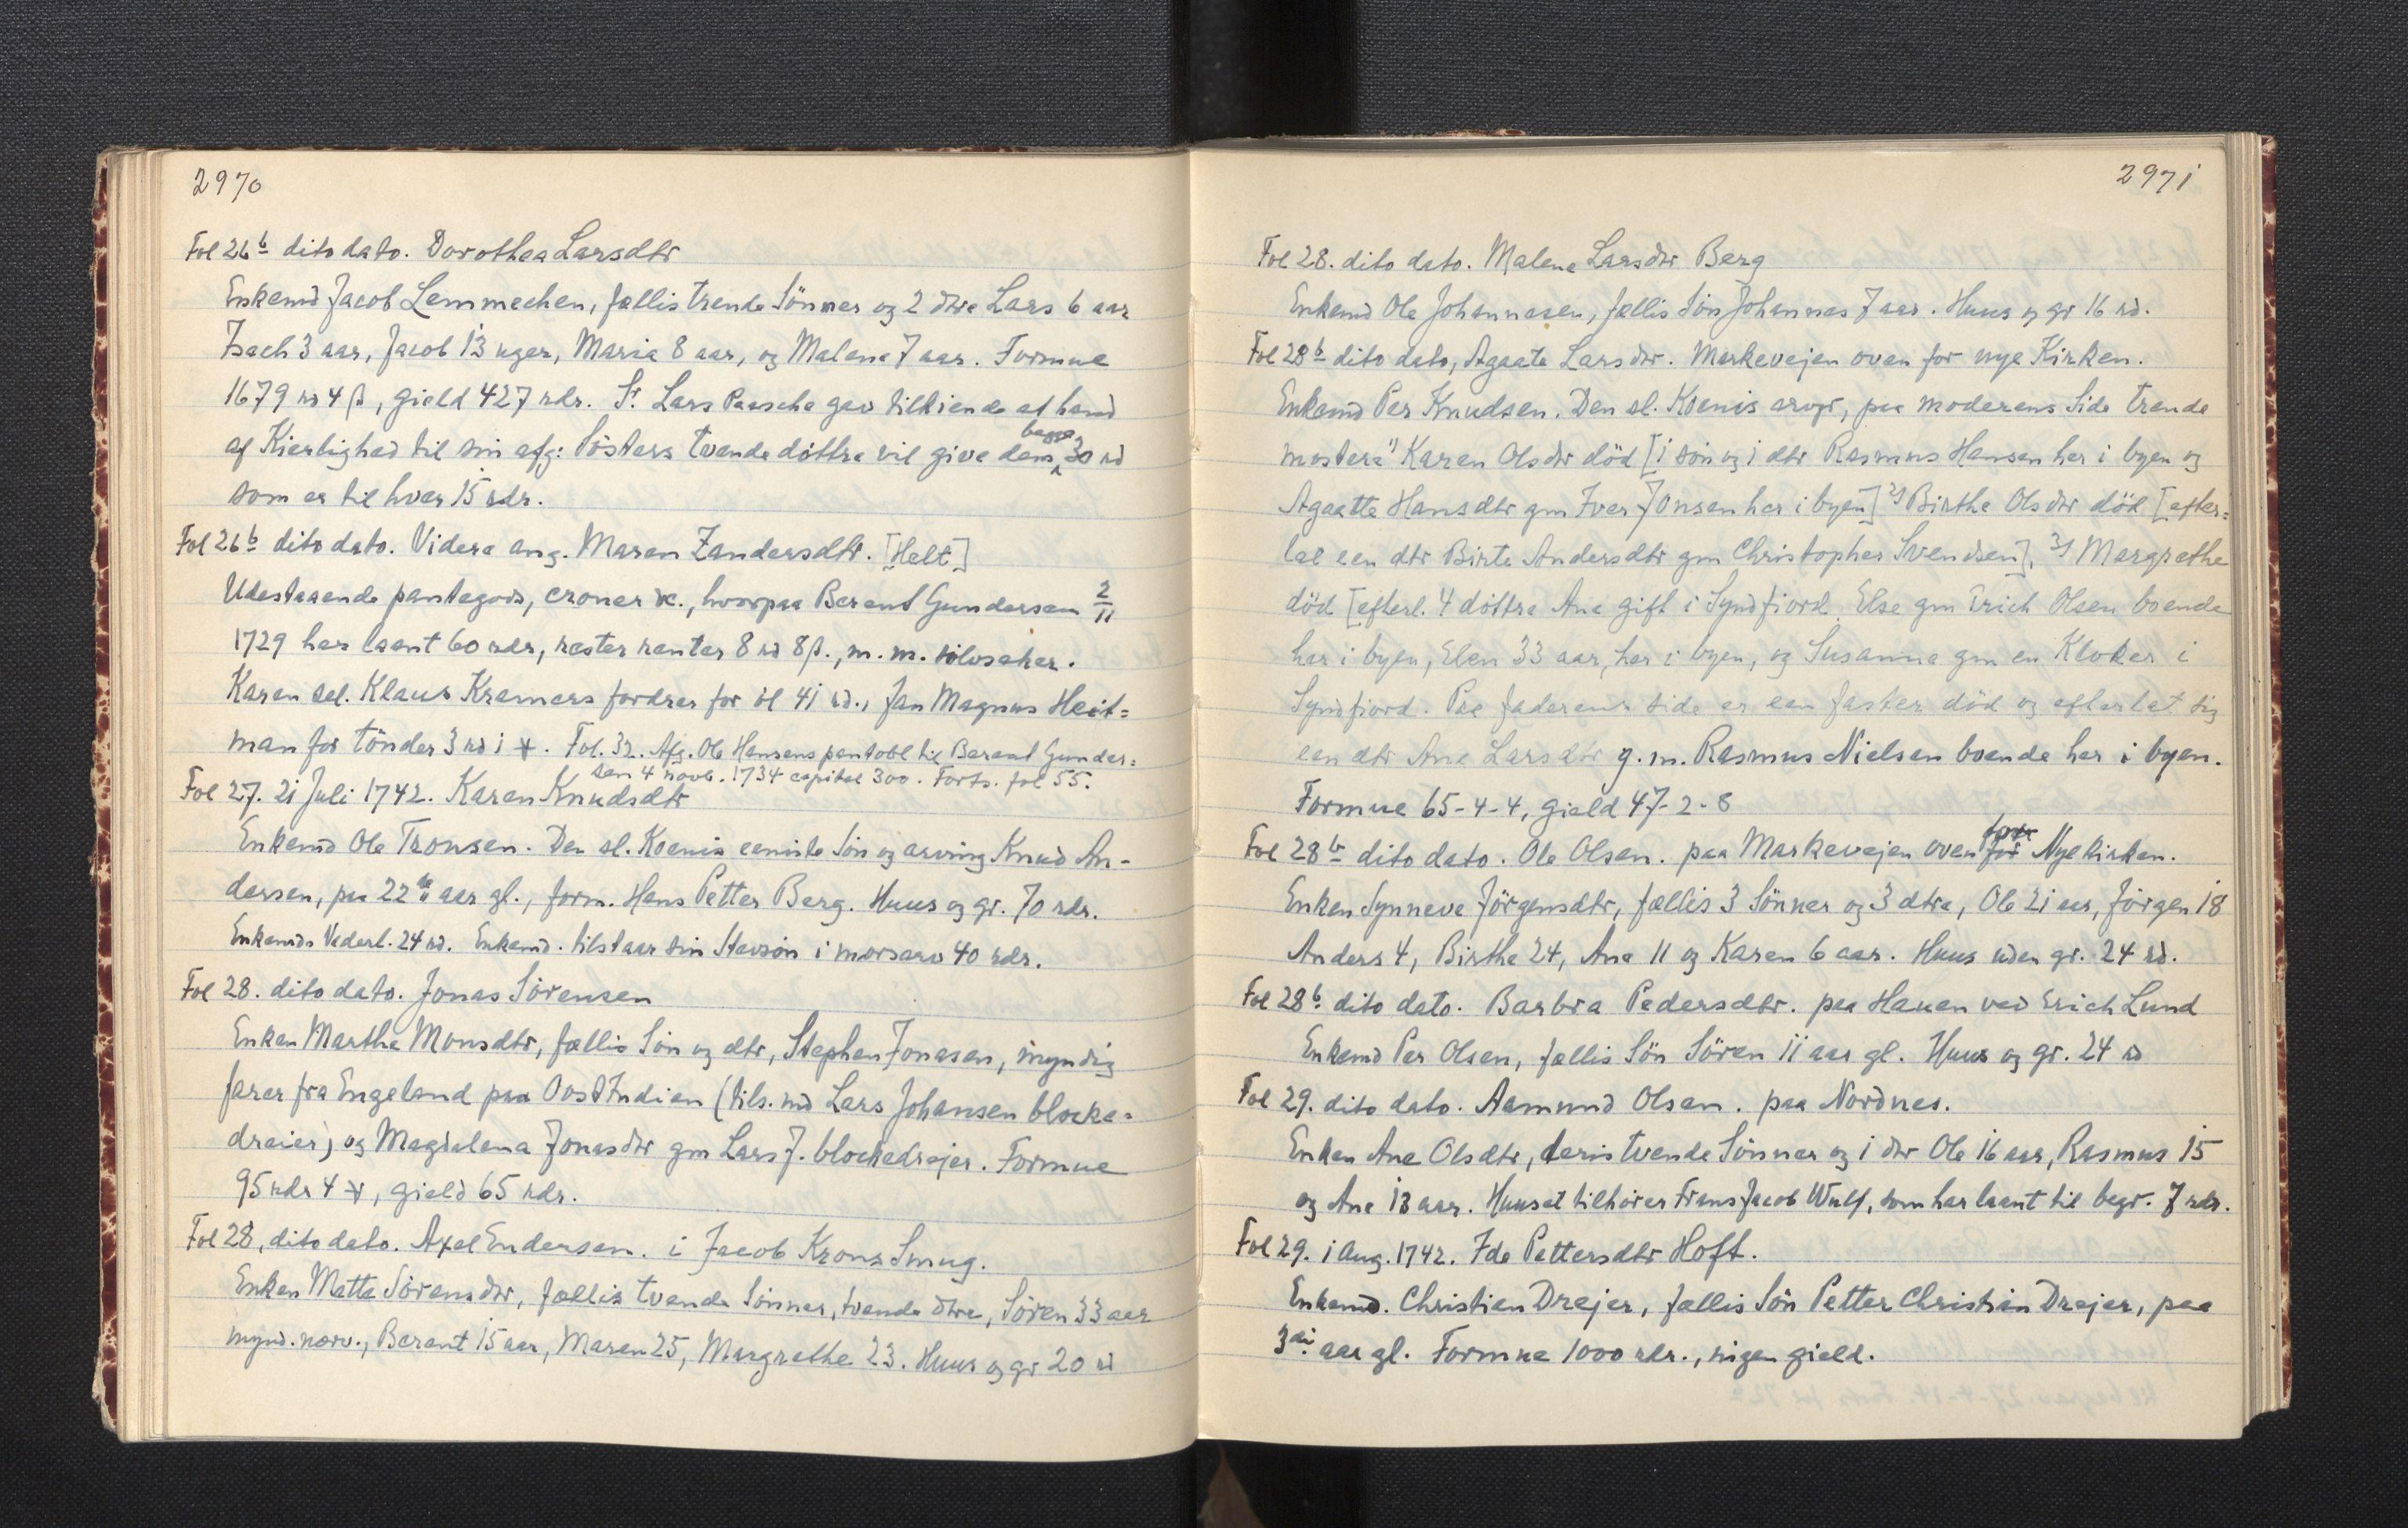 SAB, Sollied, Olaf og Thora - samlinger, 01/L0012: Skifte: Utdrag av skiftejournaler, 1740-1748